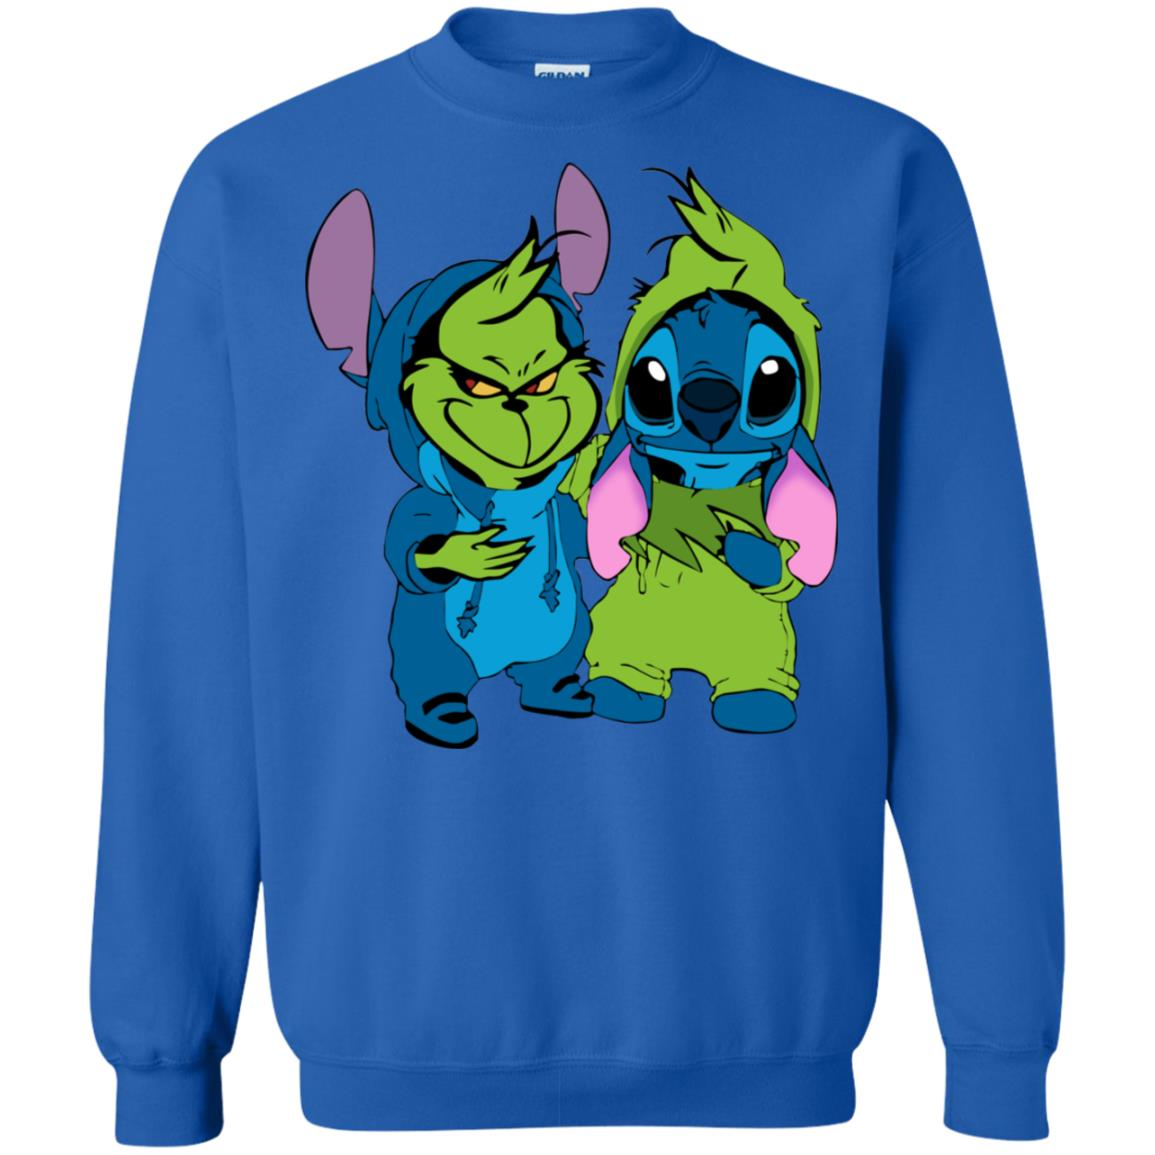 943eb40bc5d9 Baby Grinch and Stitch T shirt, Ls, Sweater - RobinPlaceFabrics